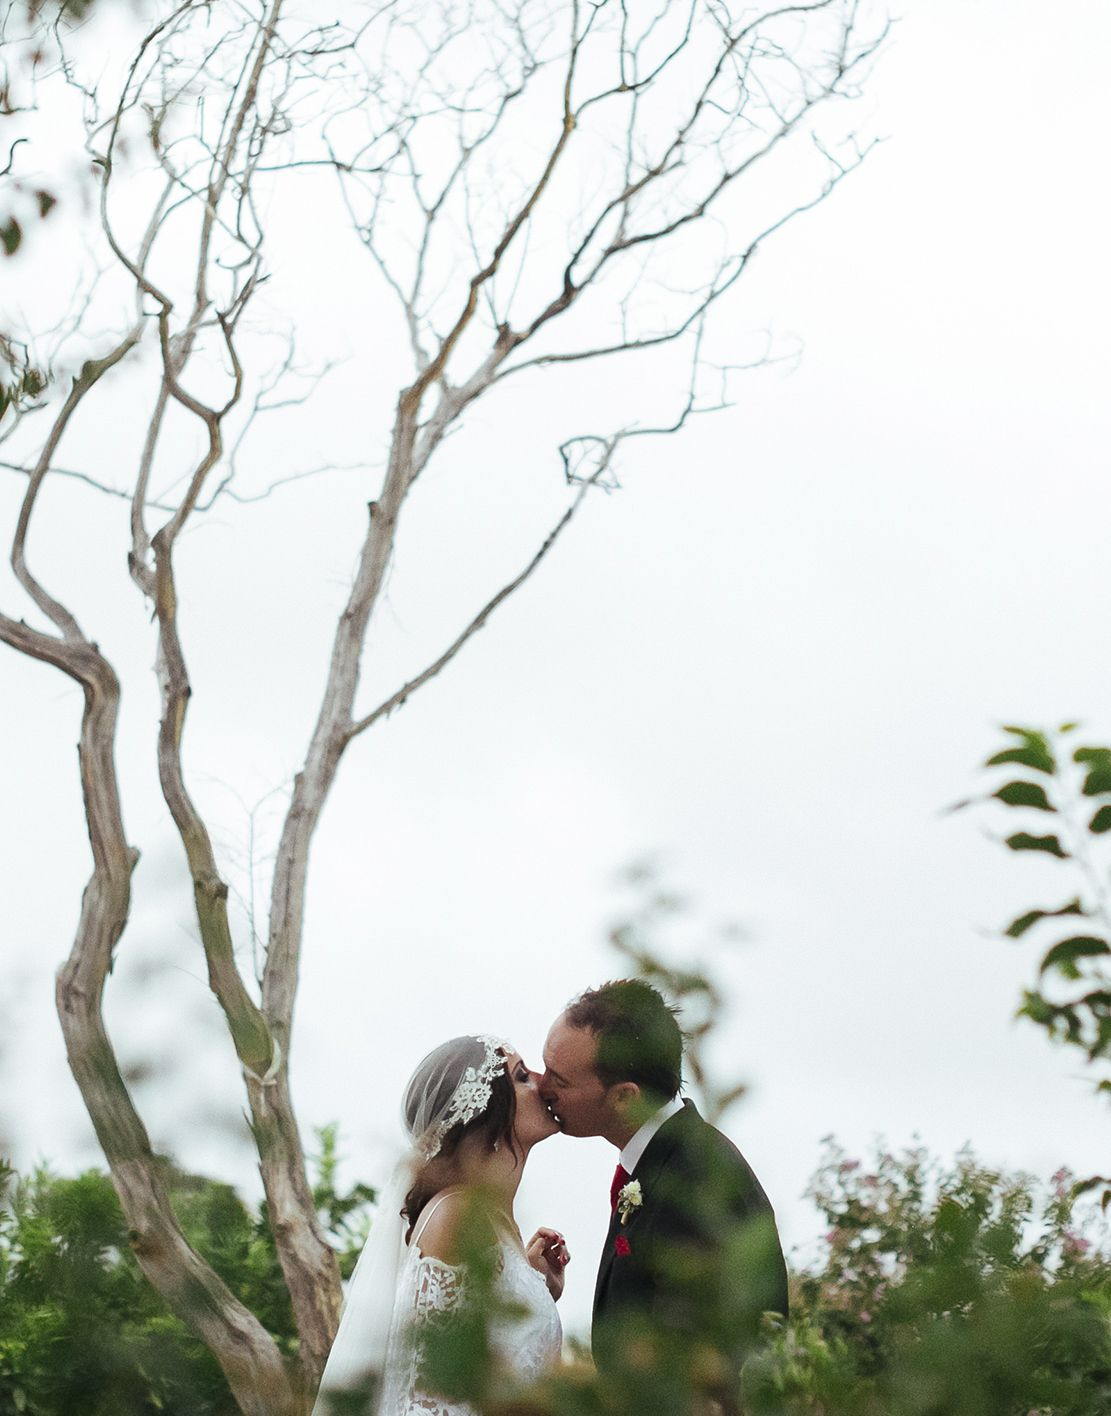 pareja besándose #novios #wedding #bodas #beso #kiss